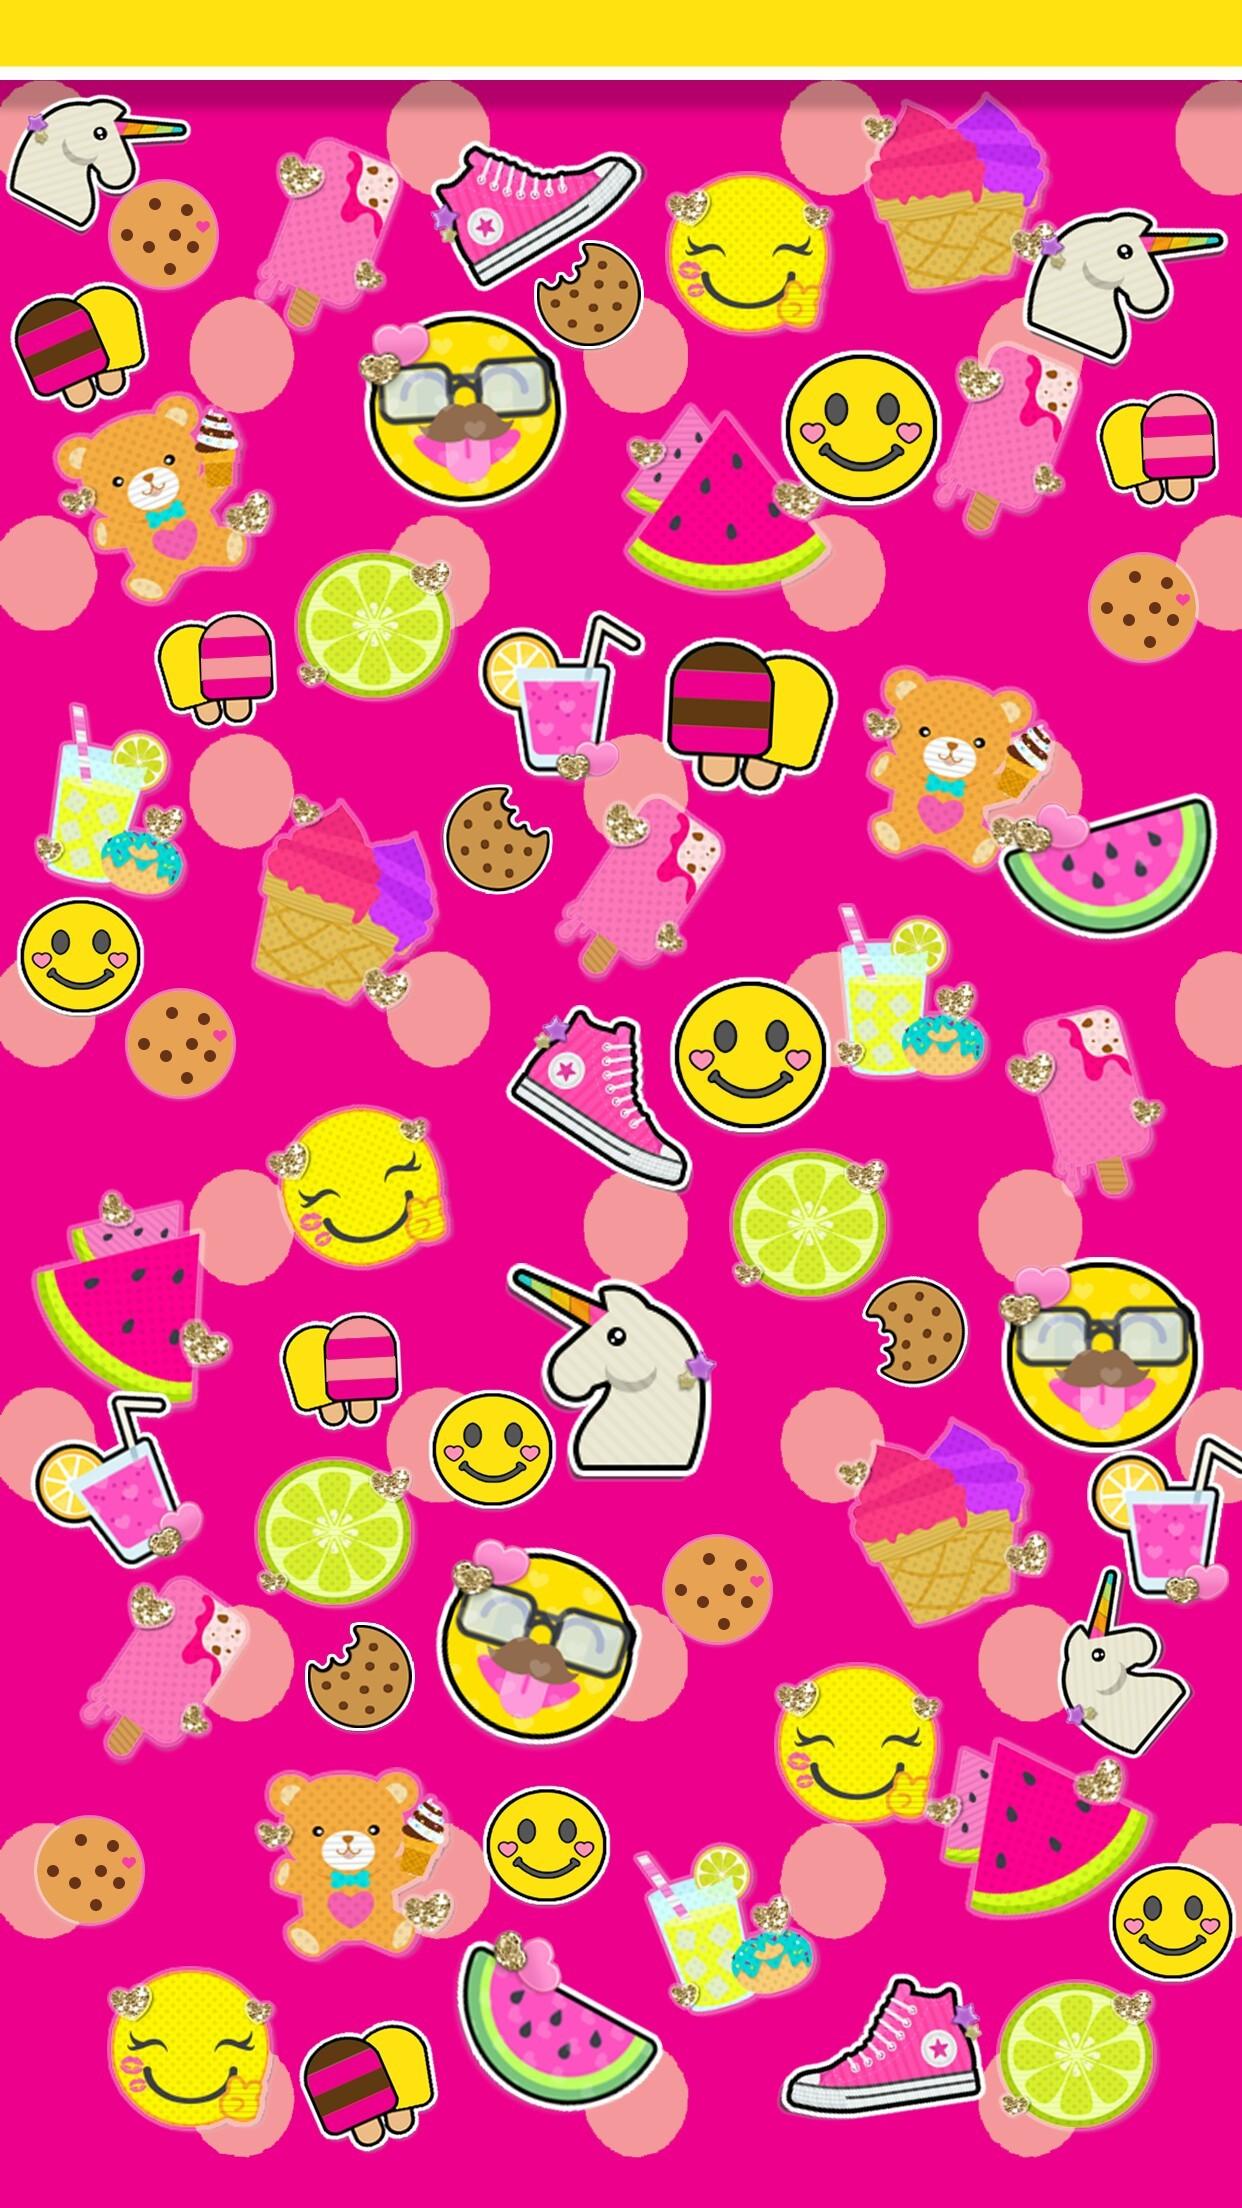 Kawaii phone wallpaper 79 images - Kawaii phone backgrounds ...